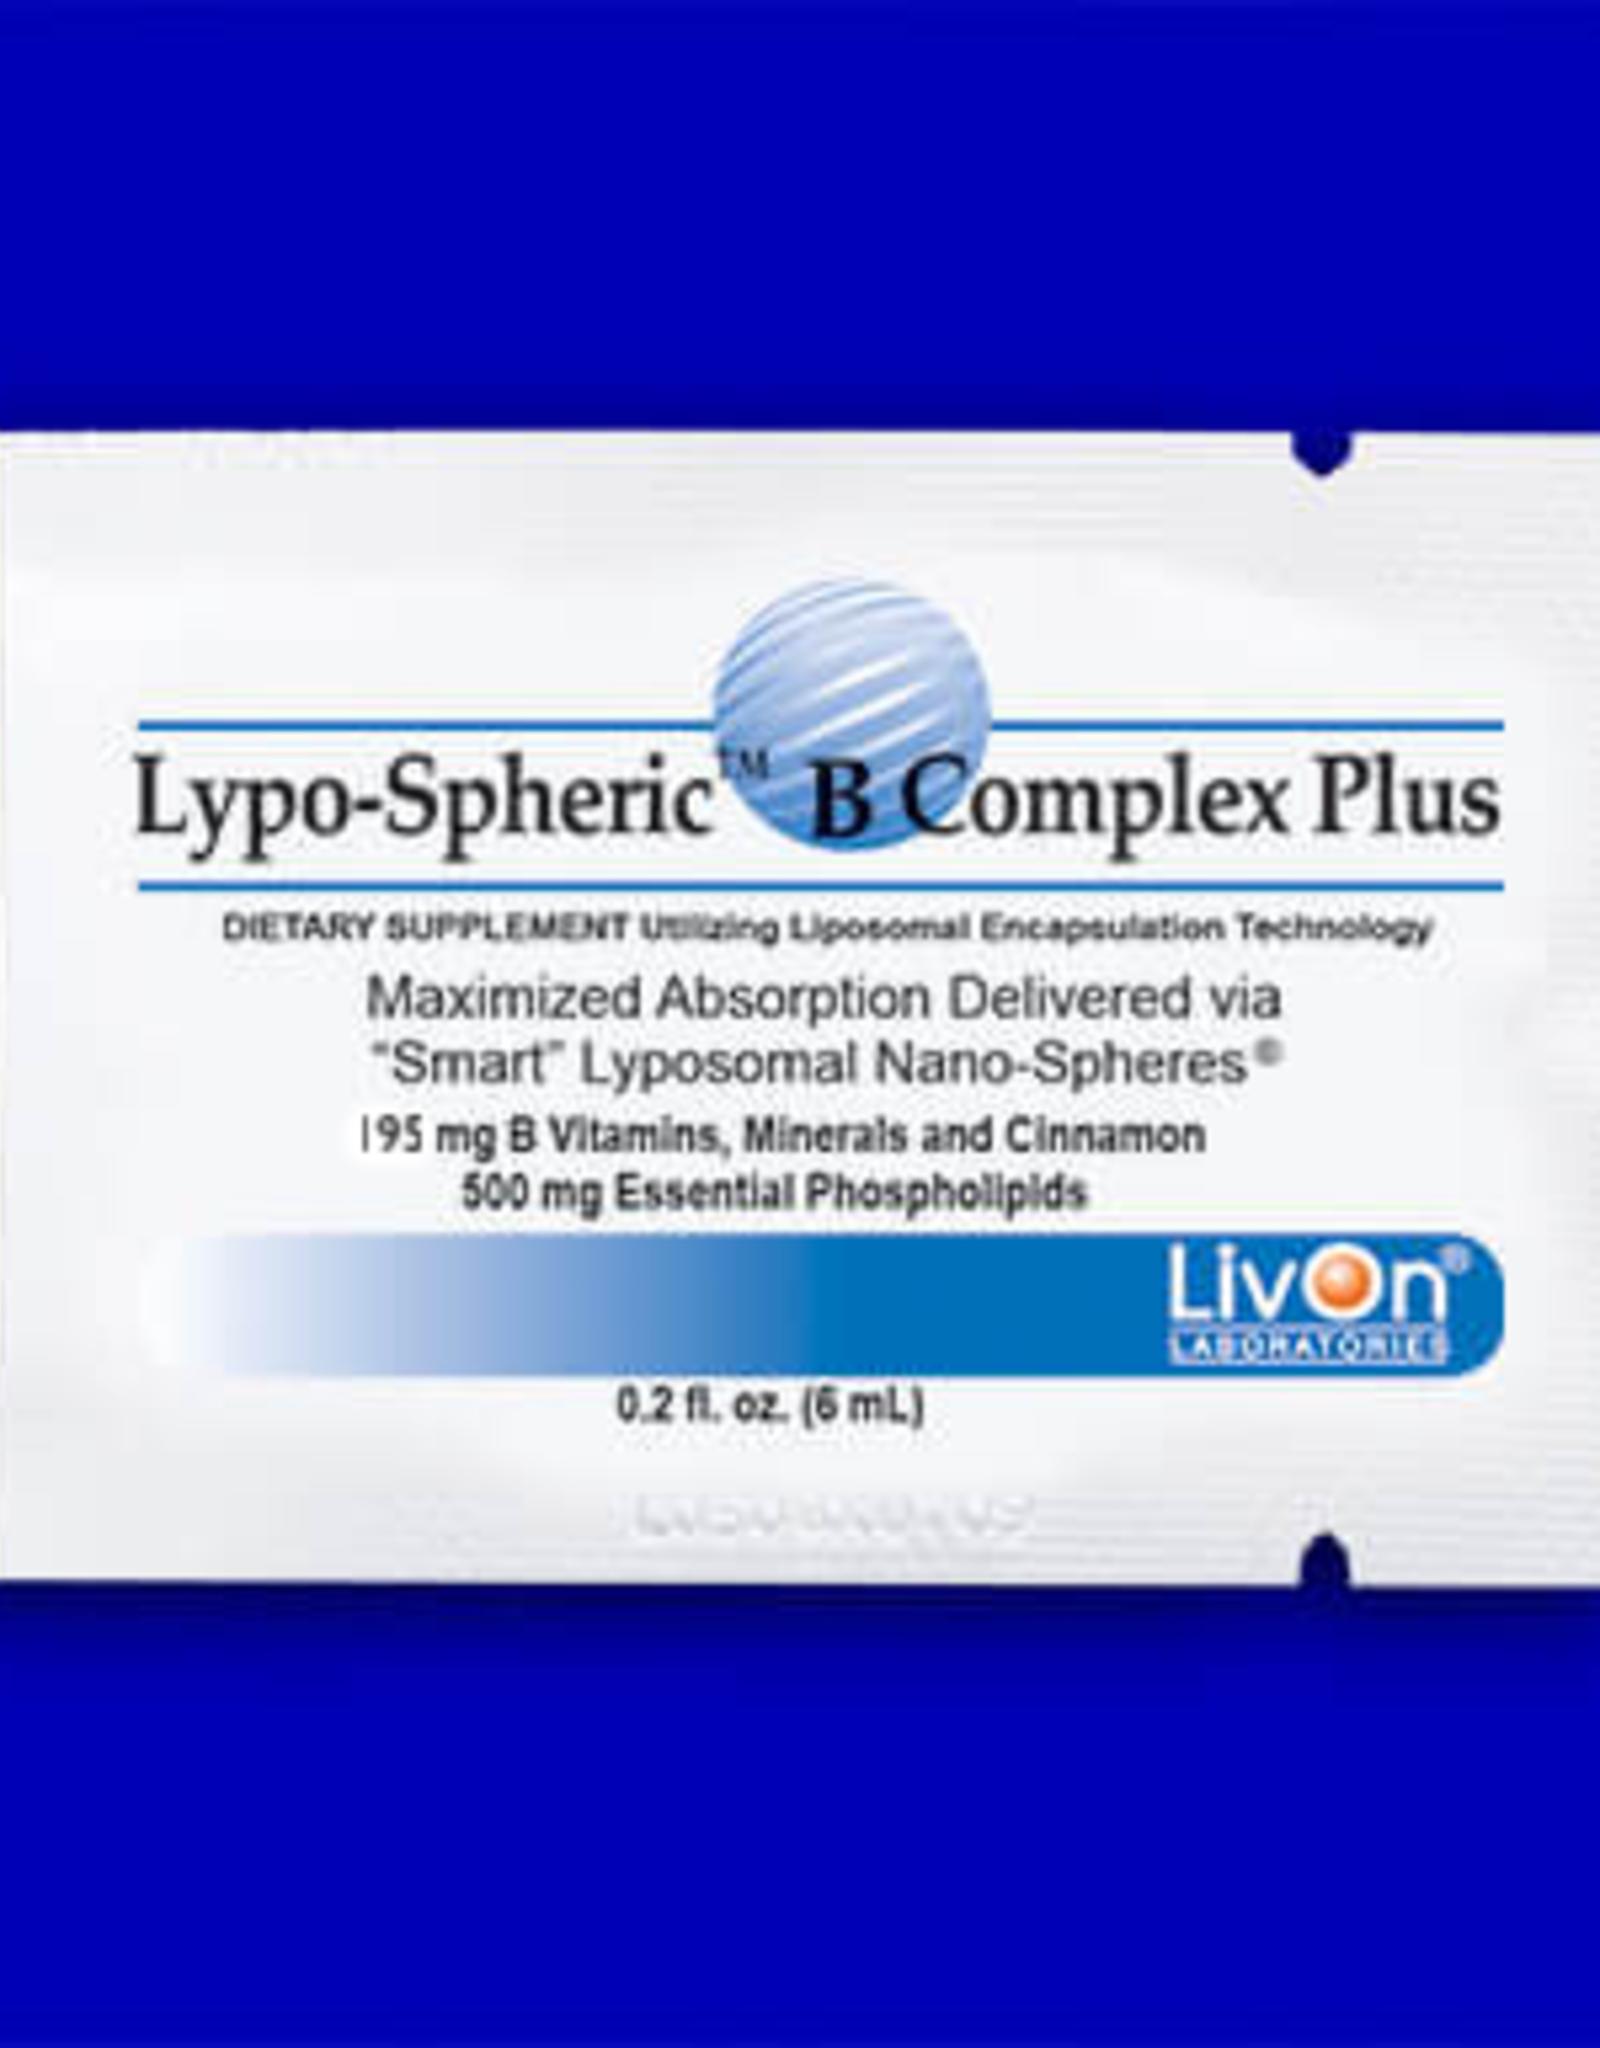 LivOn Labs Lypo-Spheric Vitamin B Complex Plus